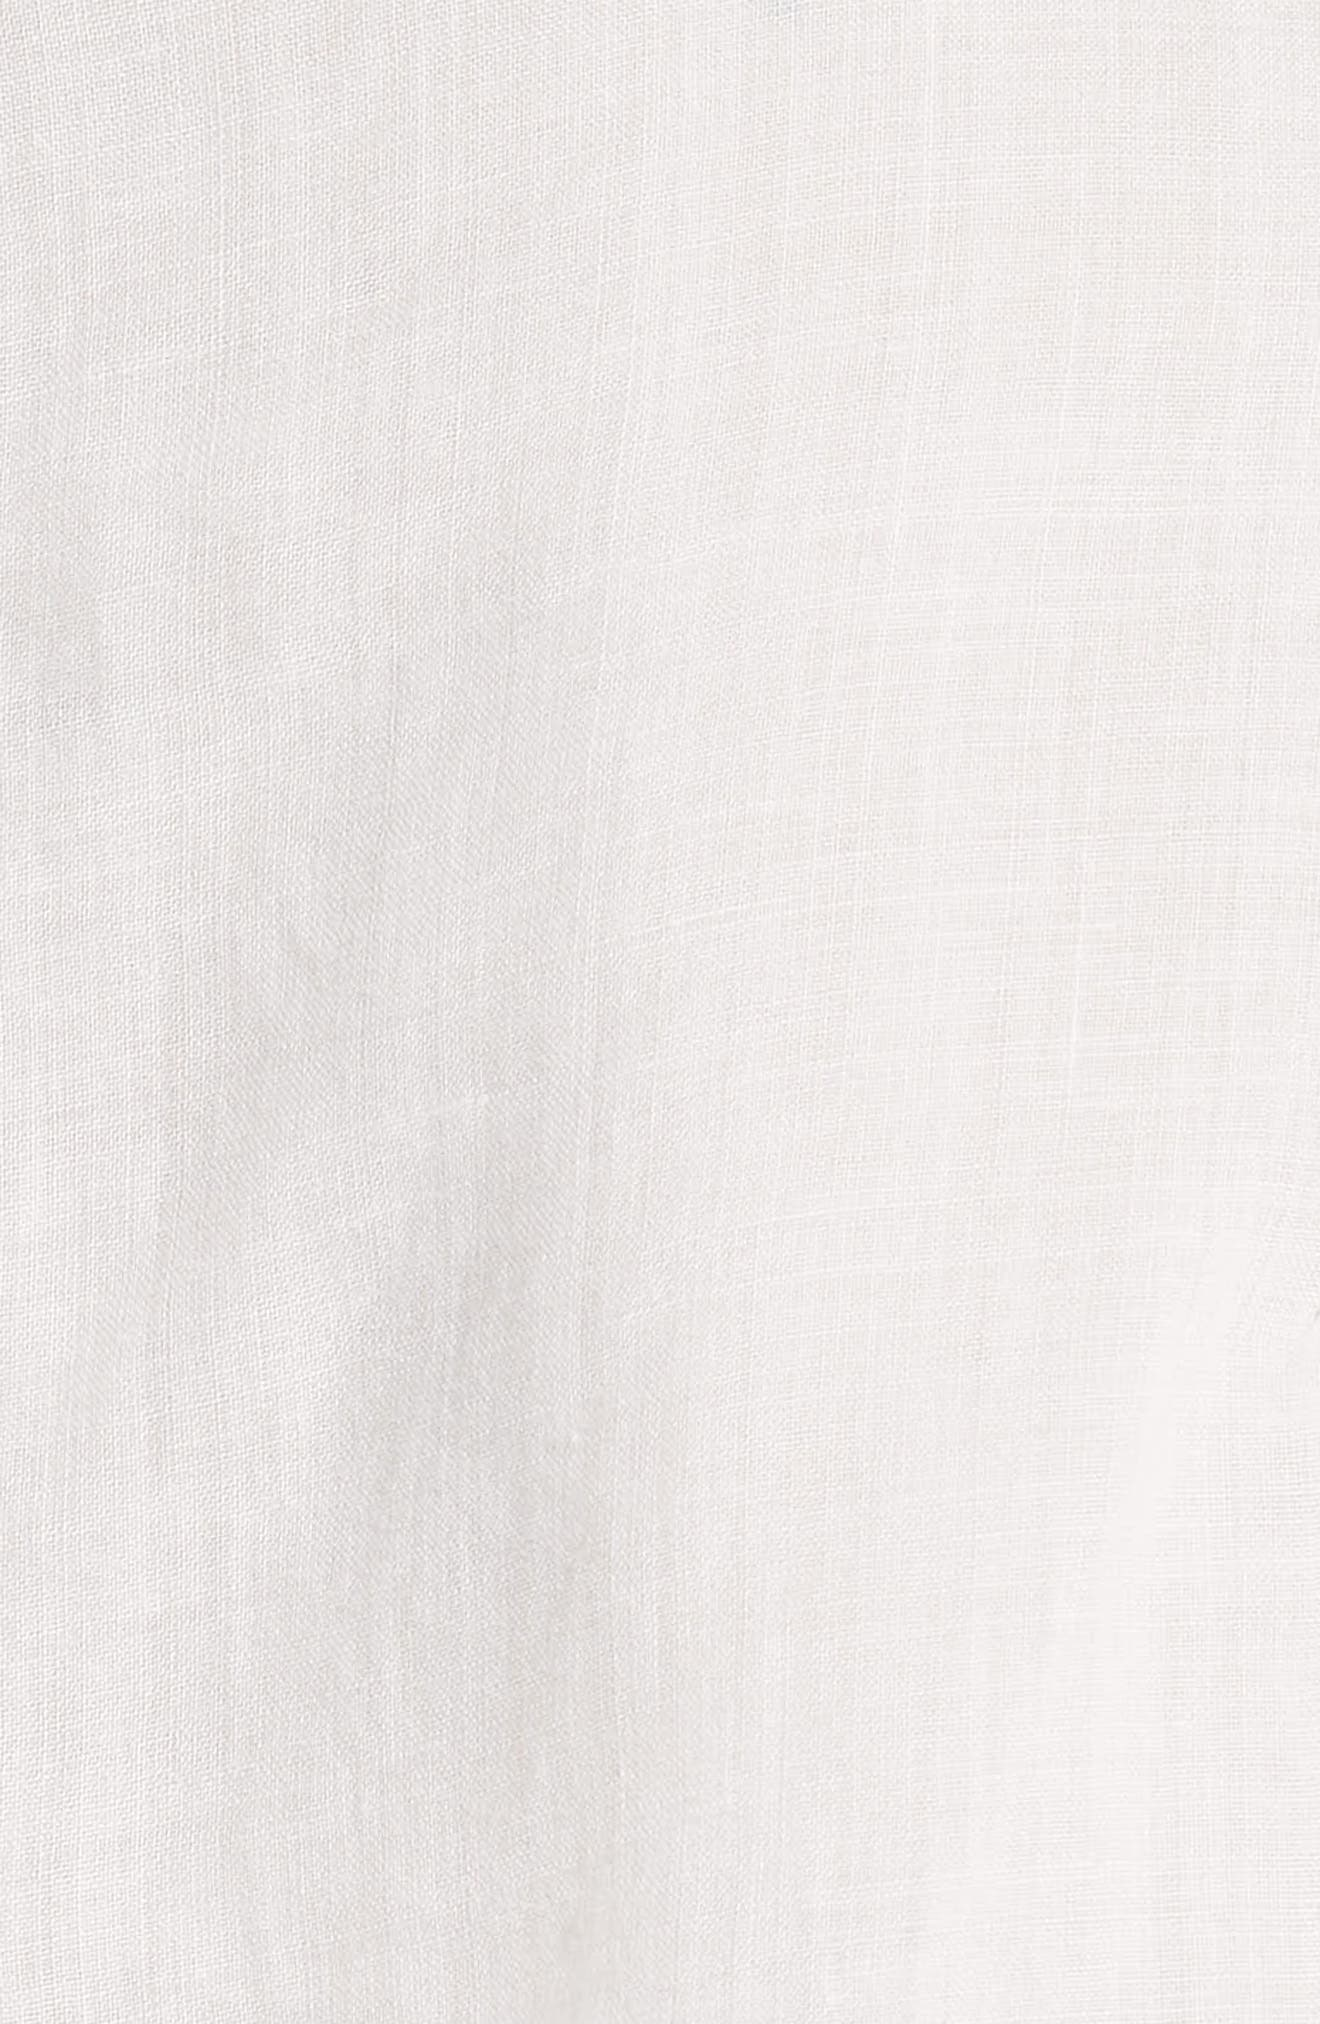 Radeli Bell Sleeve Top,                             Alternate thumbnail 5, color,                             902